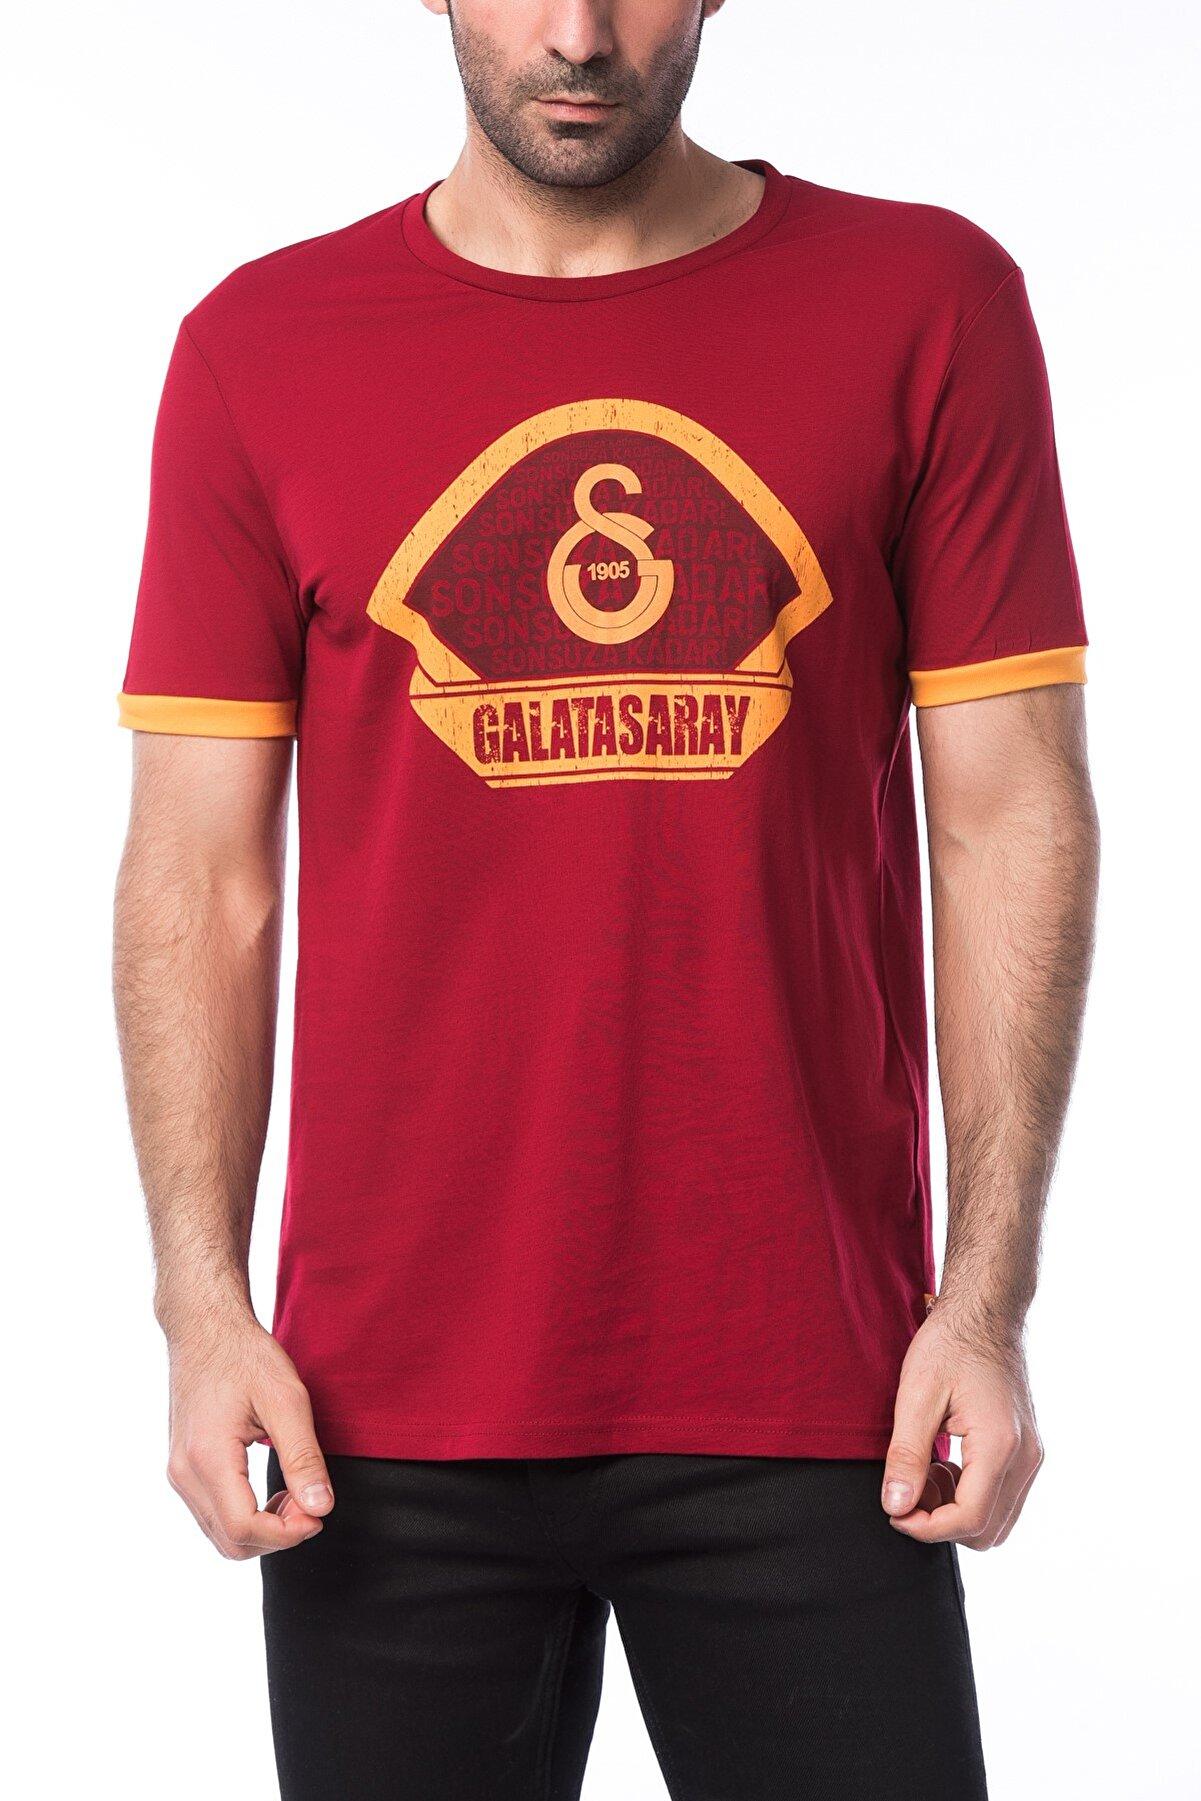 Galatasaray Galatasaray Erkek T-shirt Y023-E60386